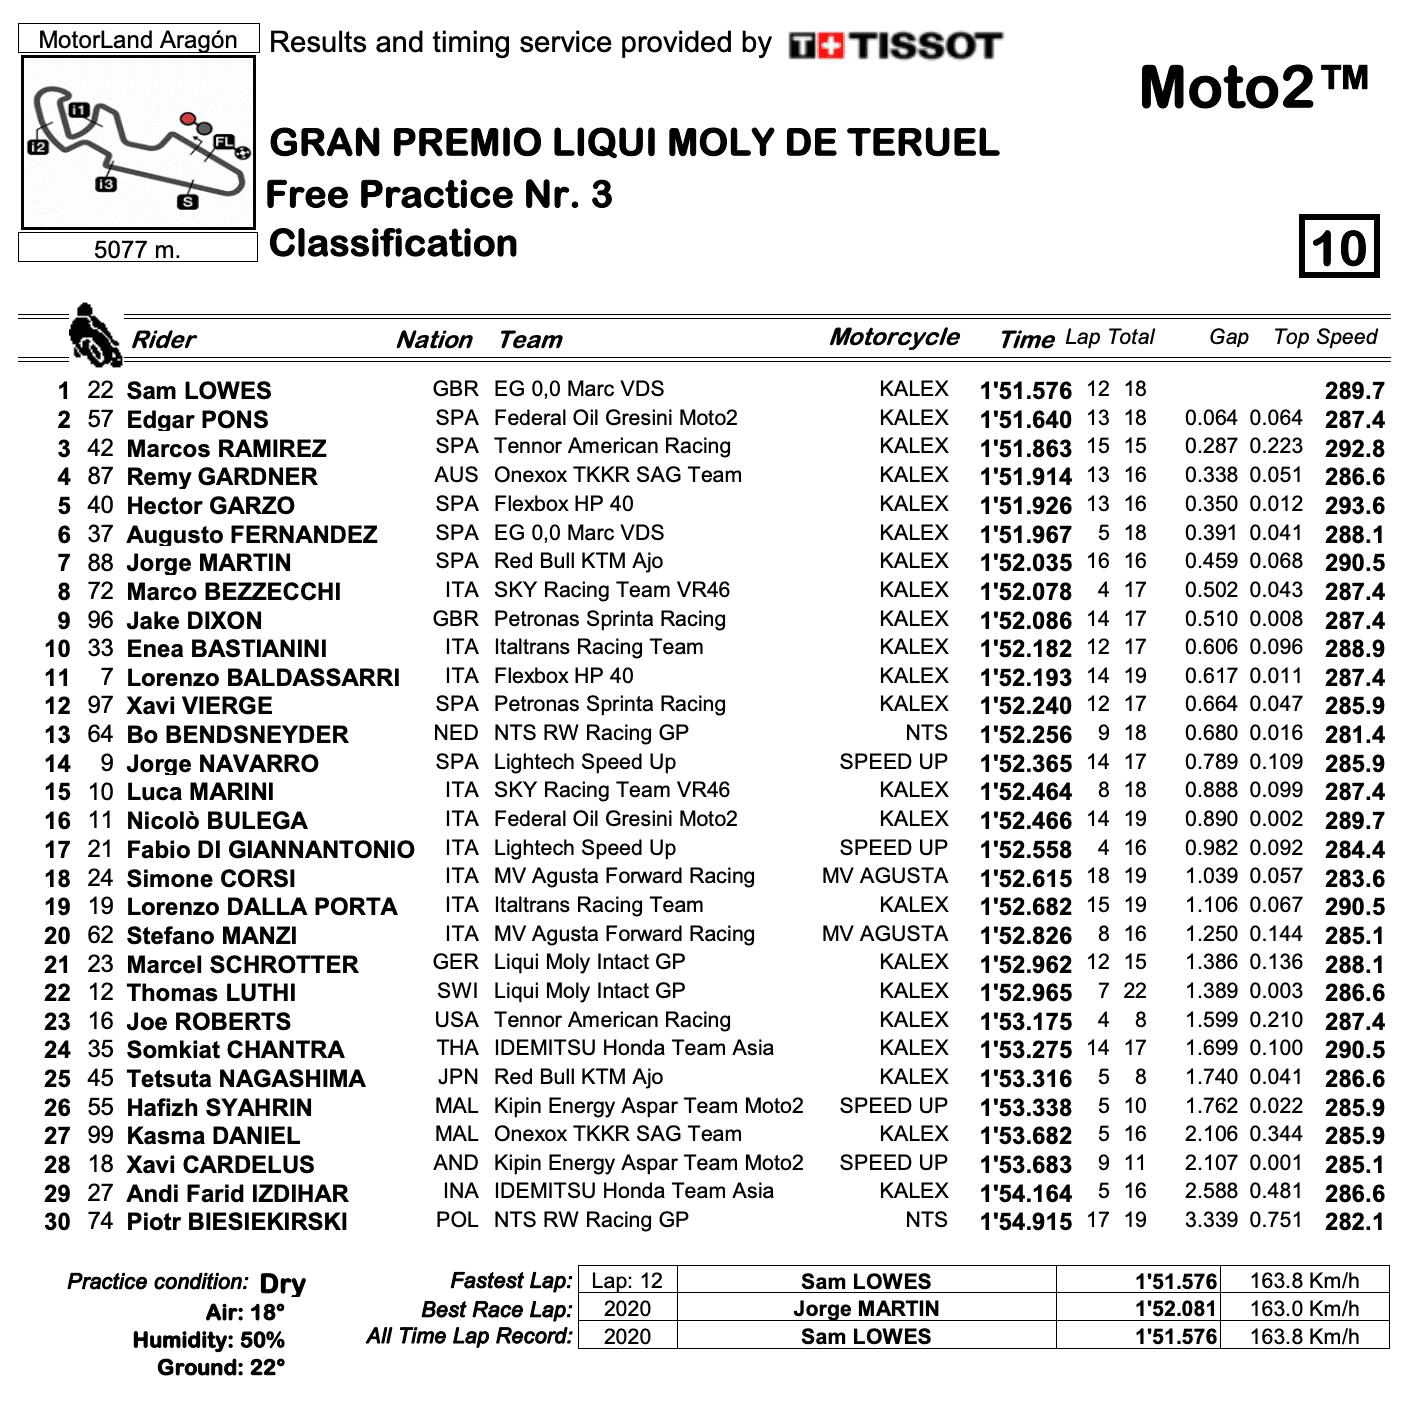 Moto2 2020テルエルGP FP3結果